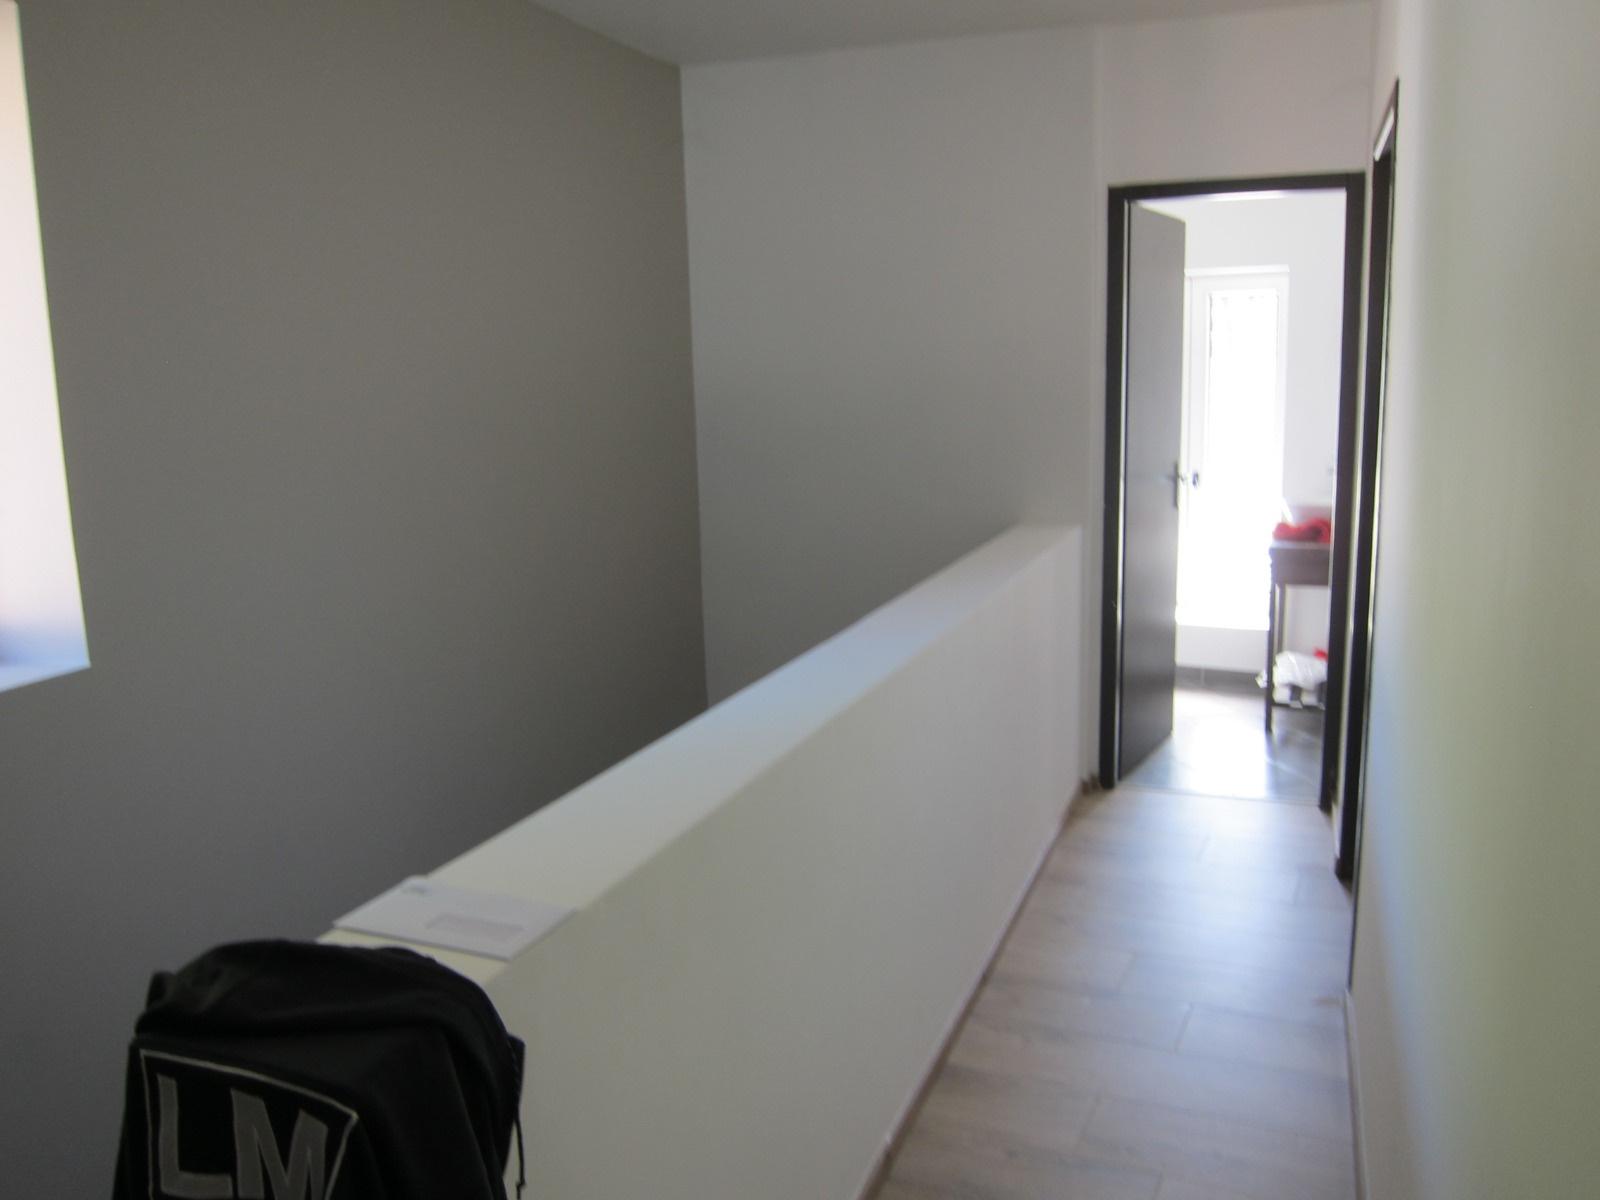 Schmidt Salle De Bain Catalogue ~ Location Appartement T4 Duplex Oyonnax